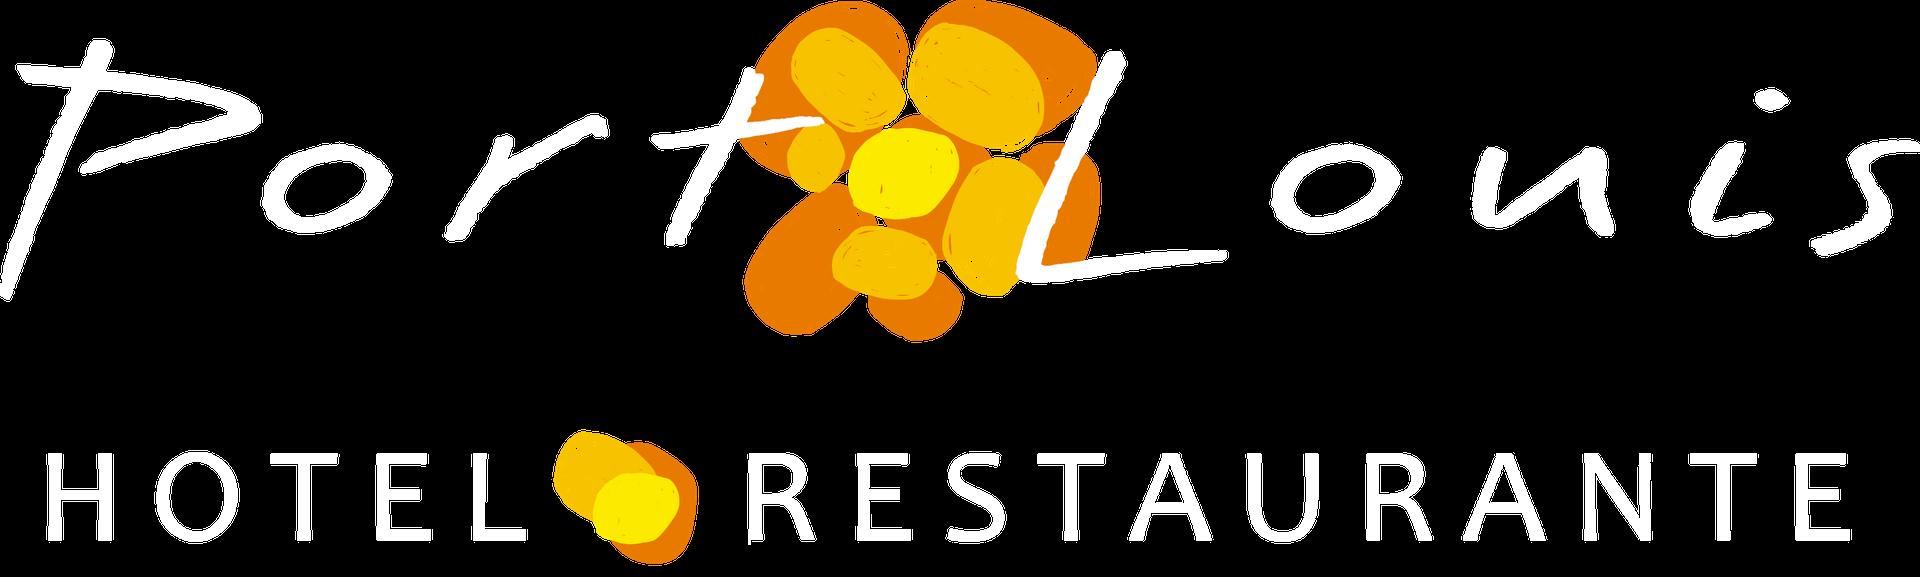 Hotel e Restaurante Port Luis